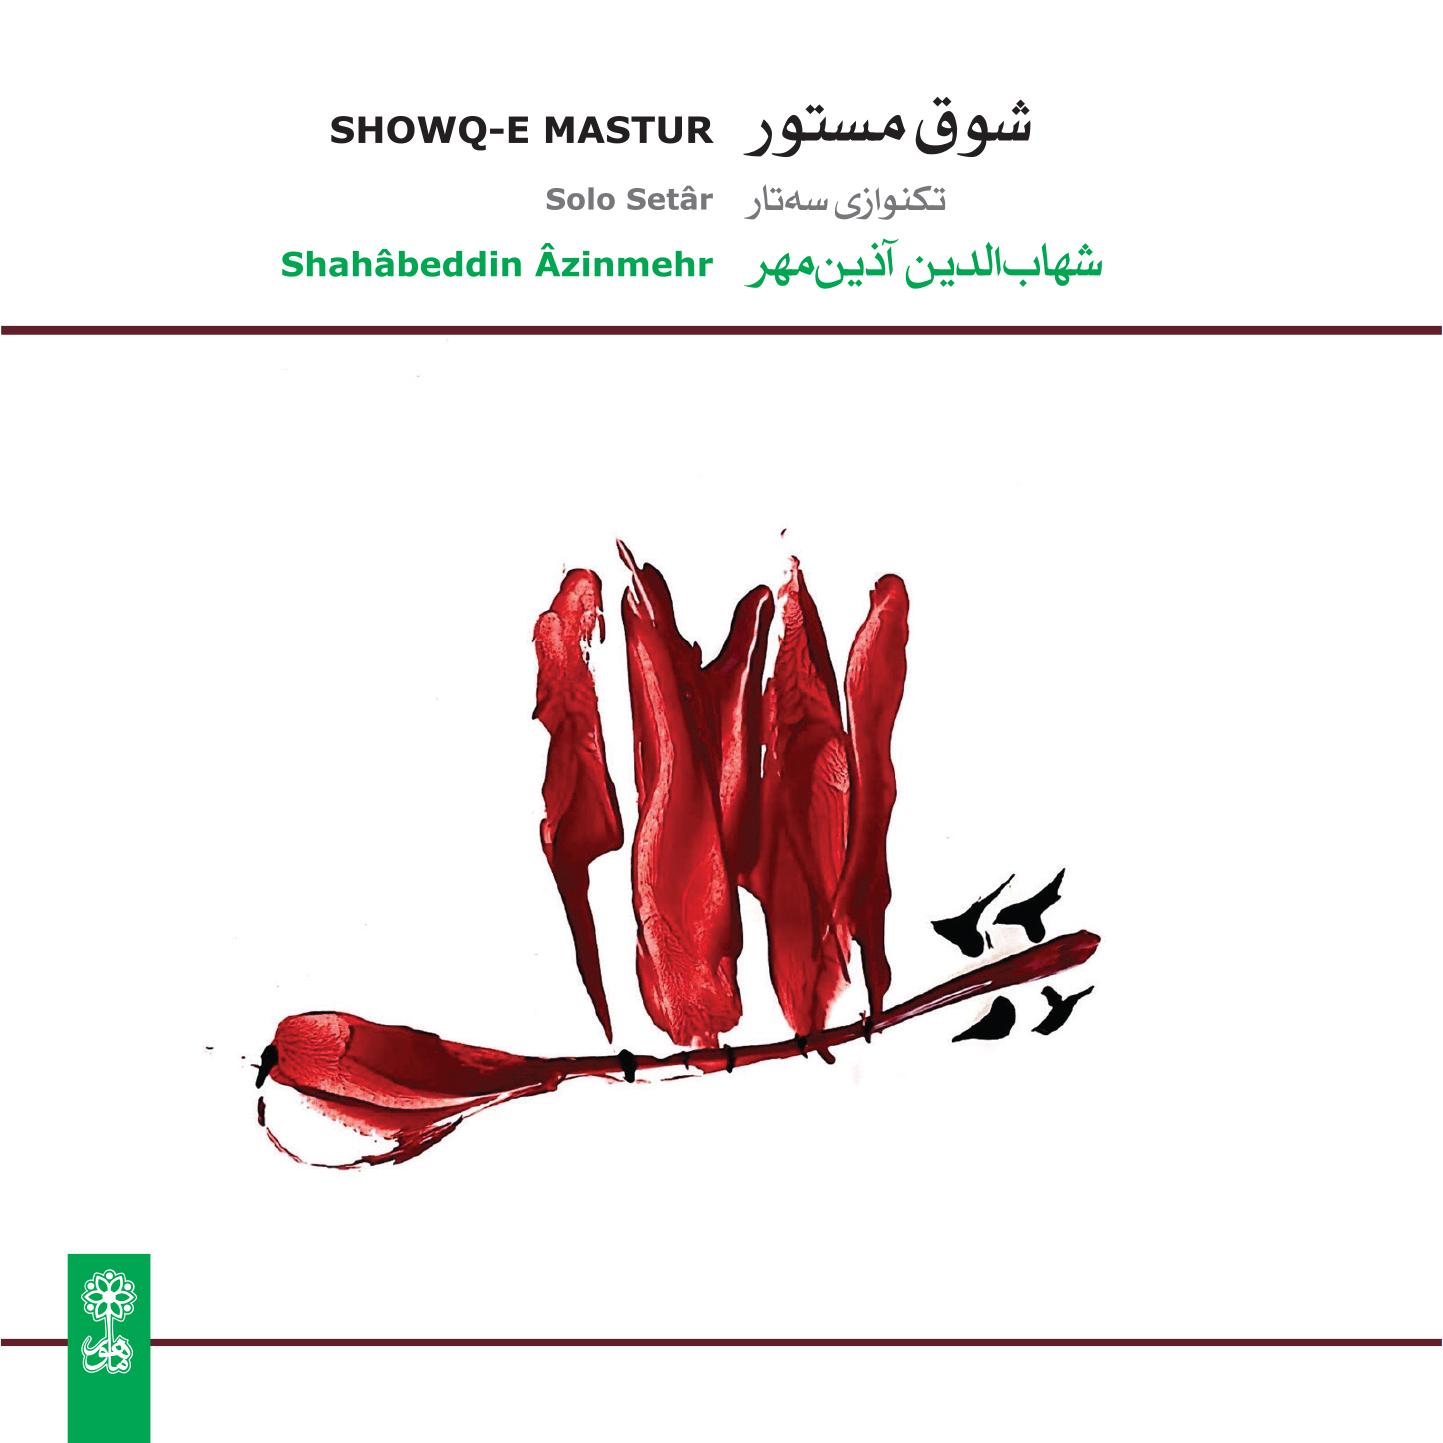 دانلود آلبوم شهاب الدین آذین مهر شوق مستور